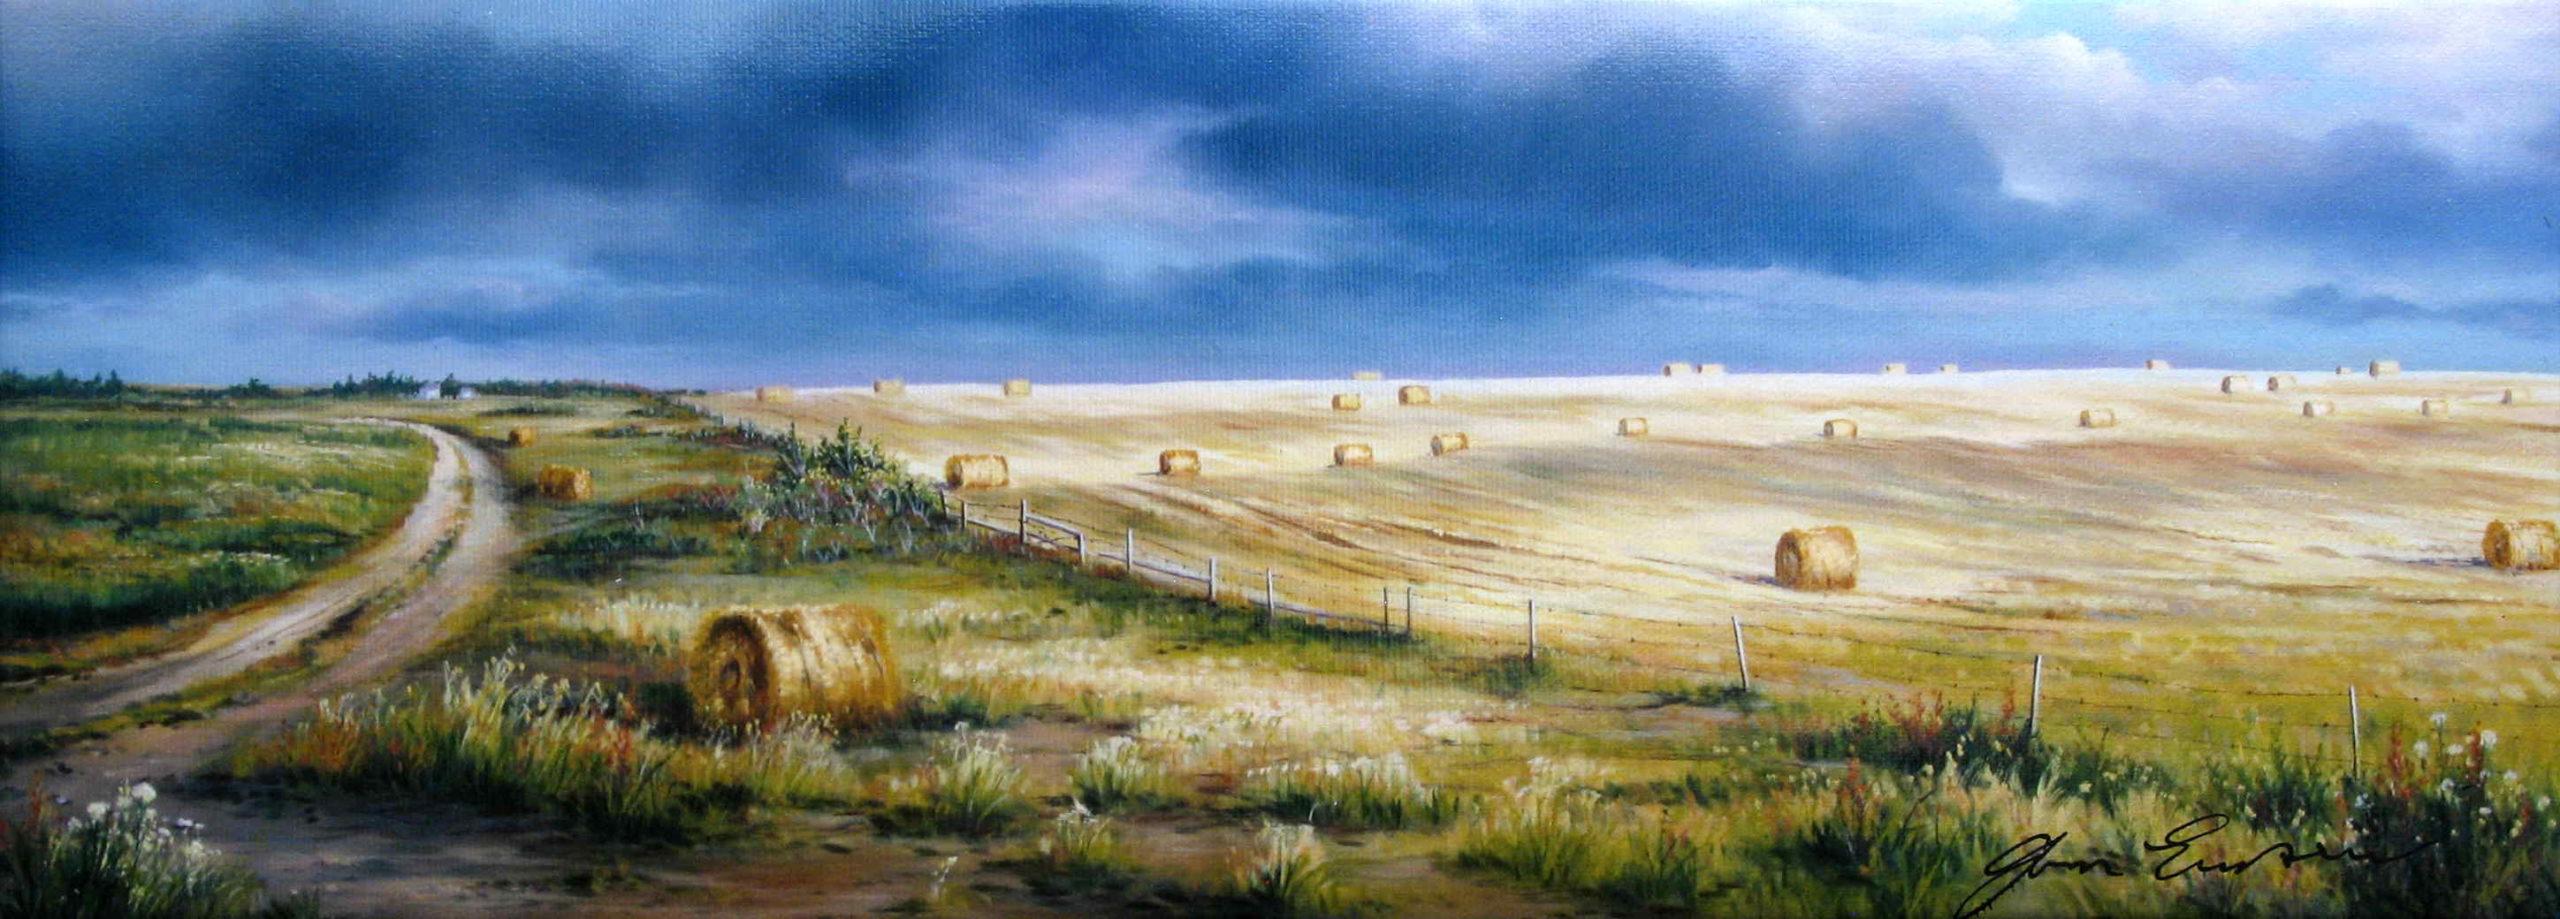 Through The Mowing Fields Jonn Einerssen